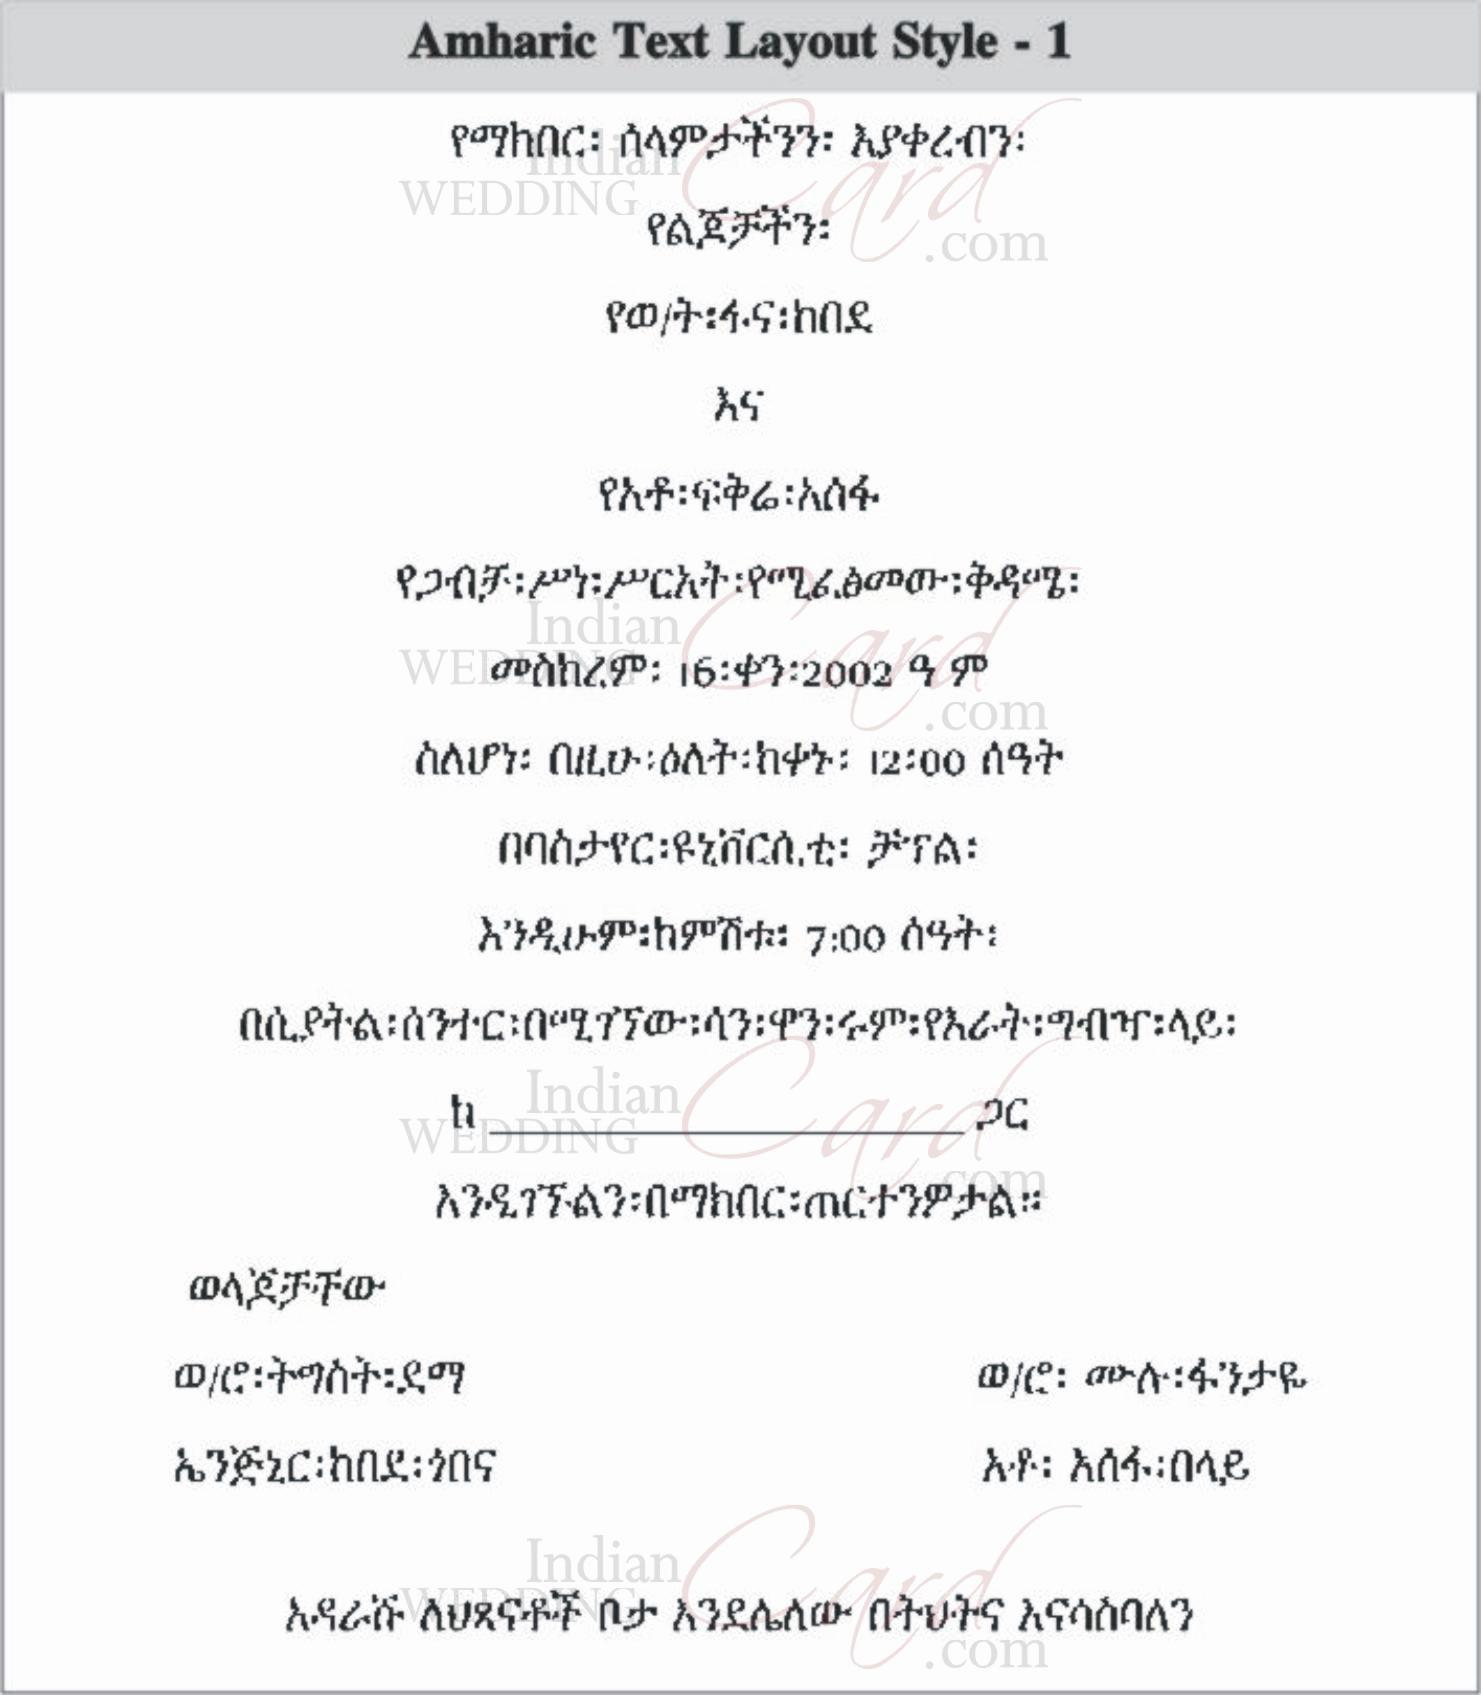 Ethiopian Wedding Invitation Cards Inspirational Scroll Wedding Invitations Scroll Invitations Wedding